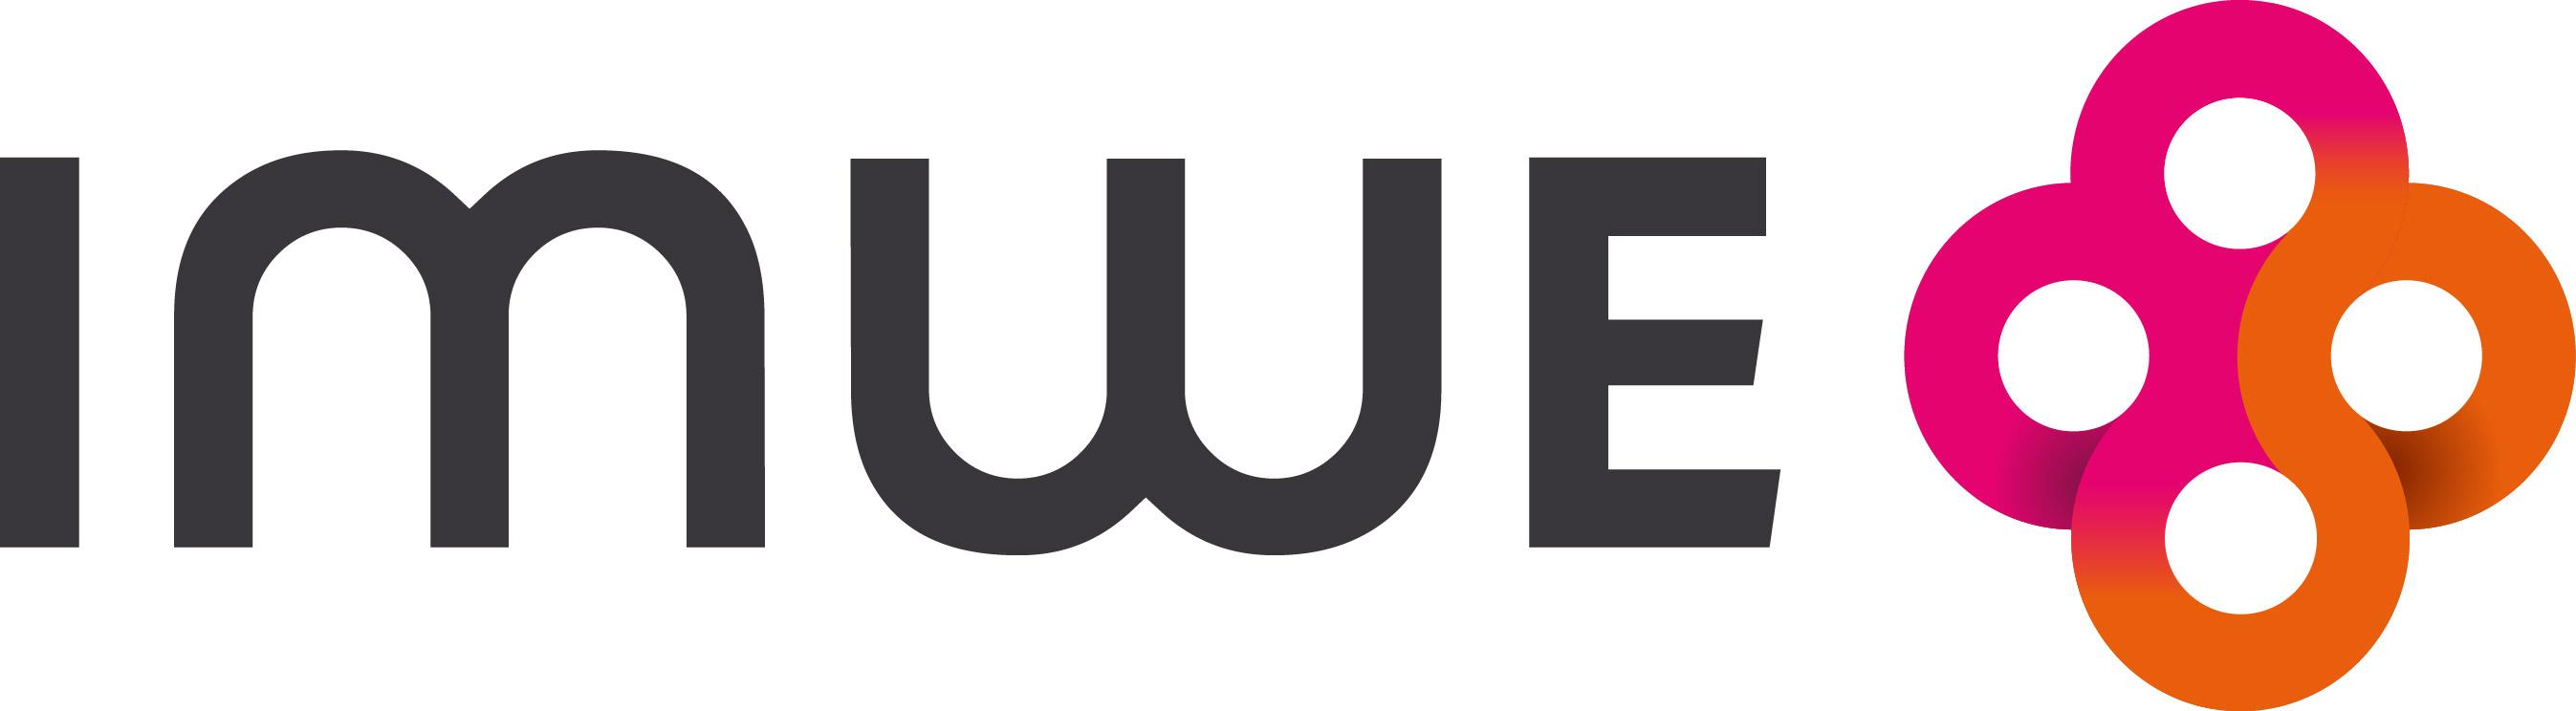 Imwe_logo2